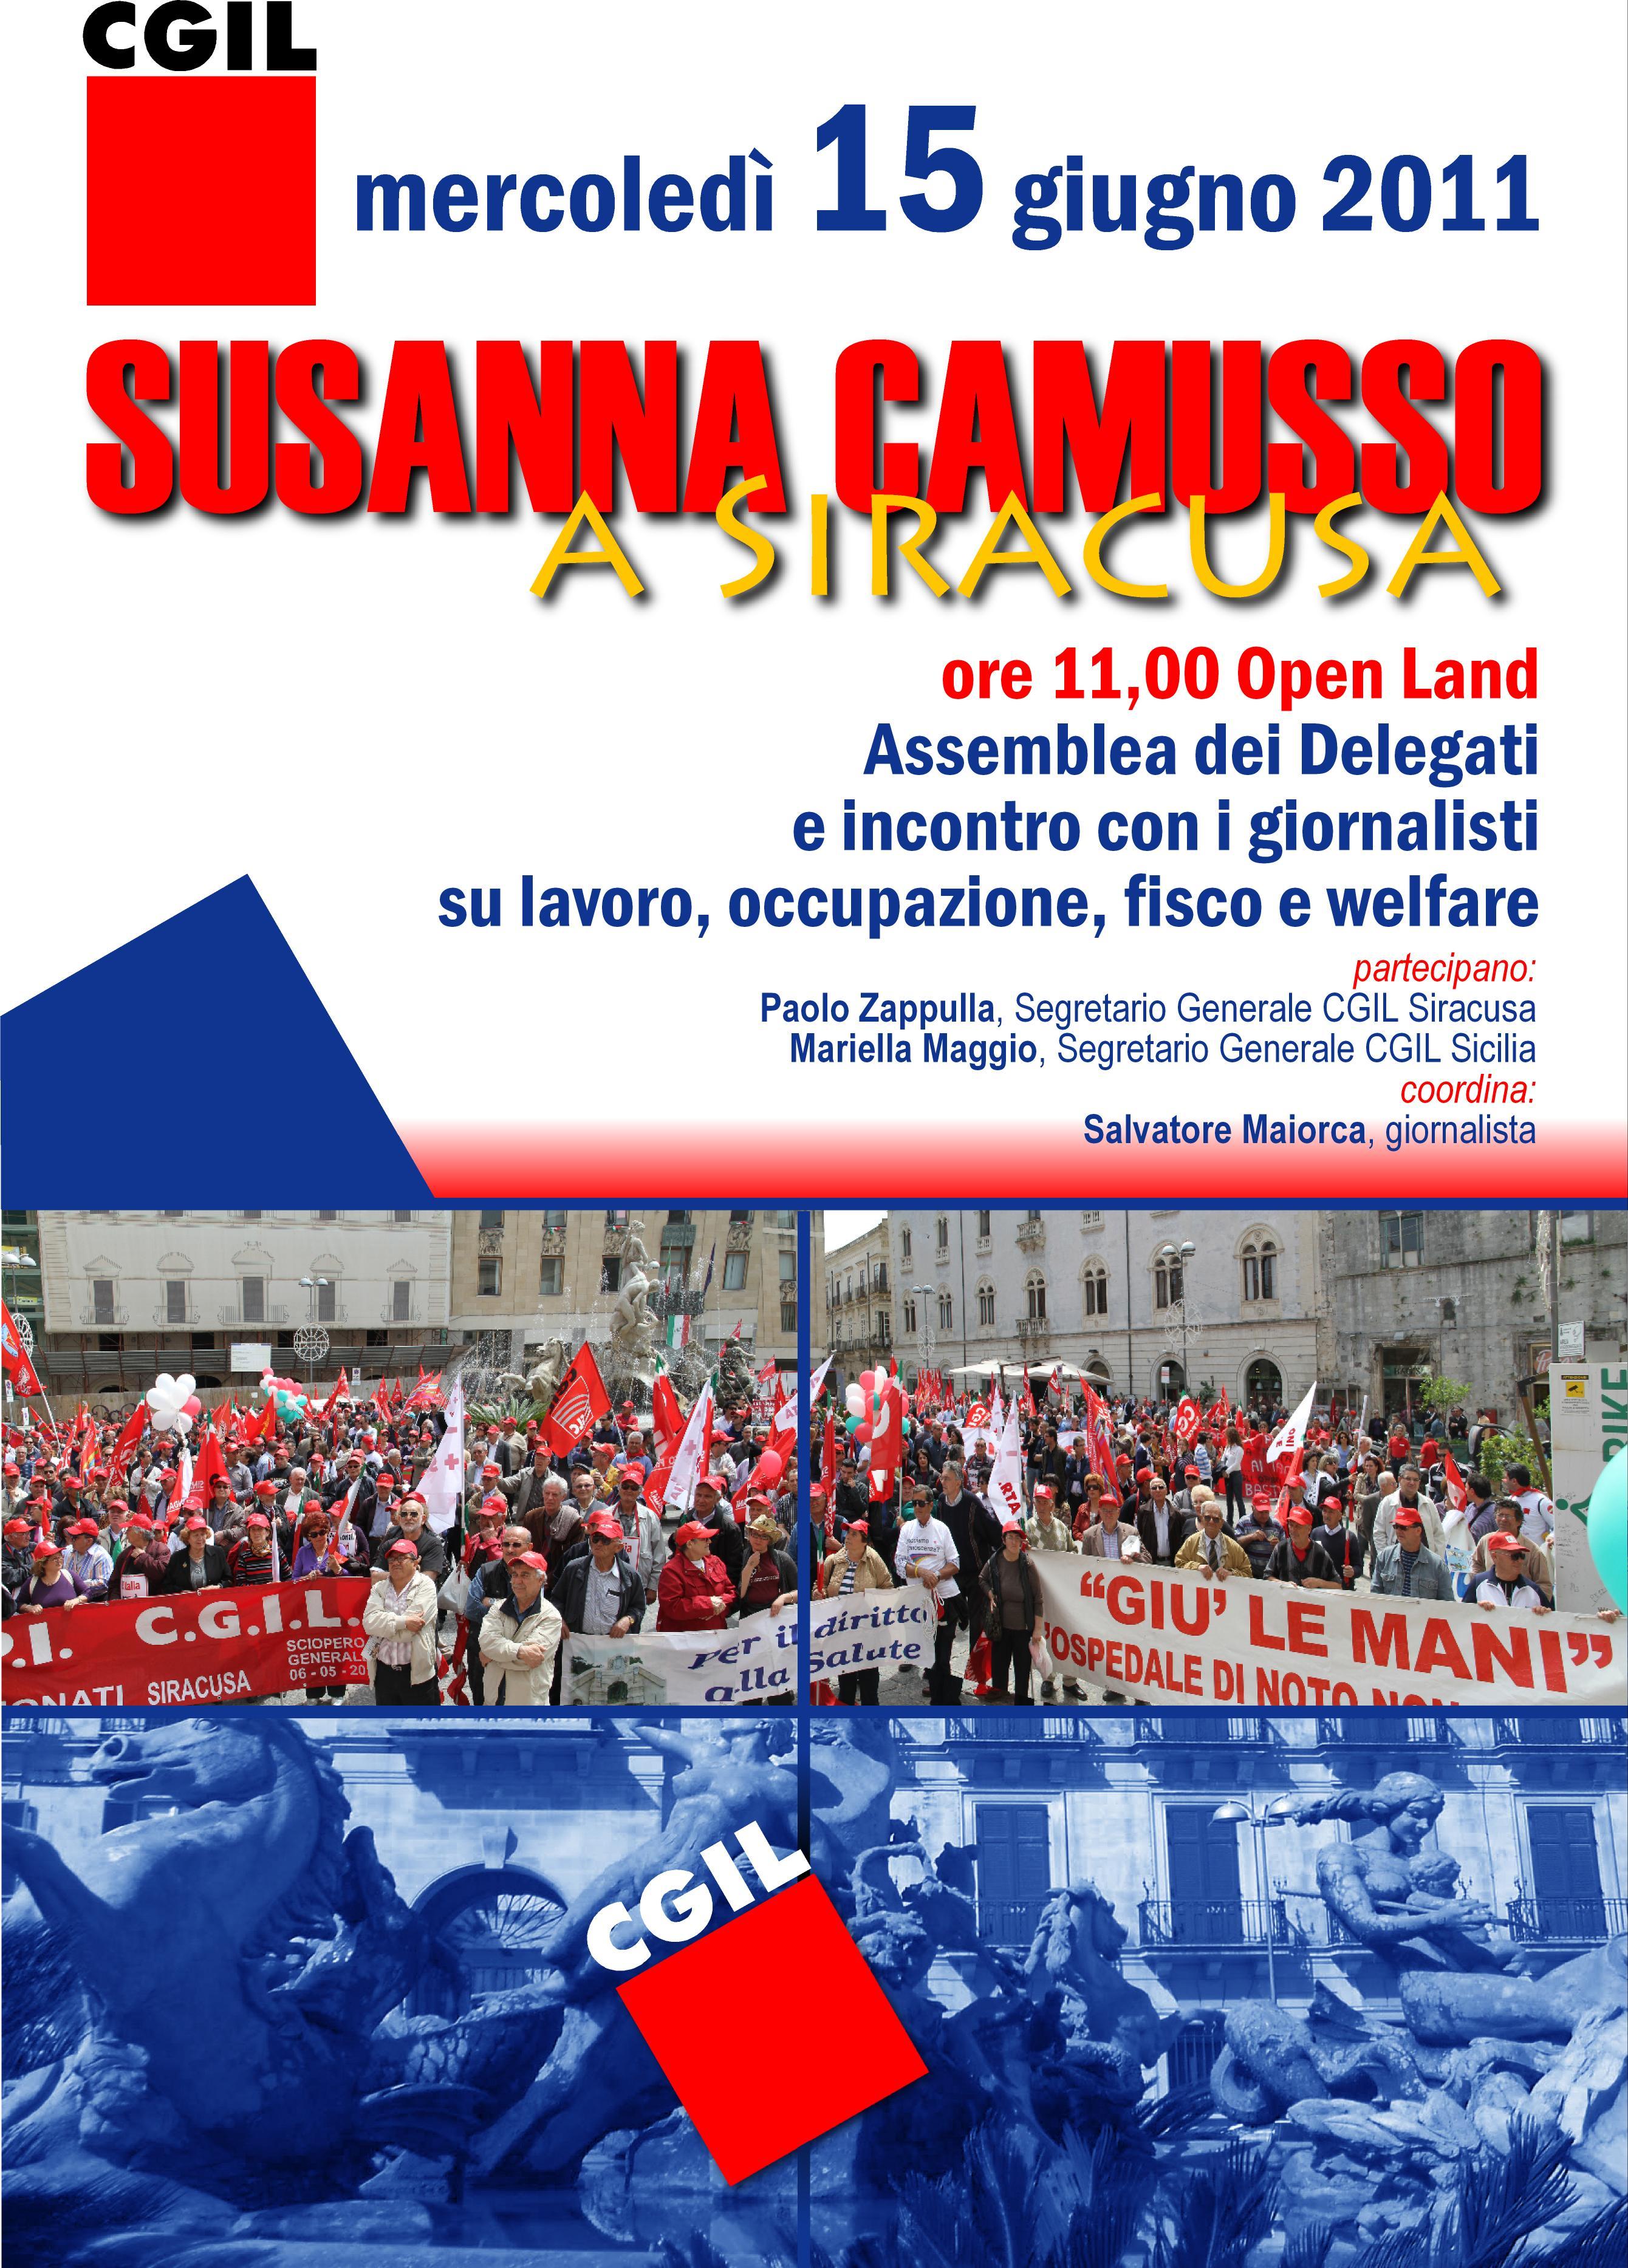 SUSANNA CAMUSSO ARRIVA A SIRACUSA